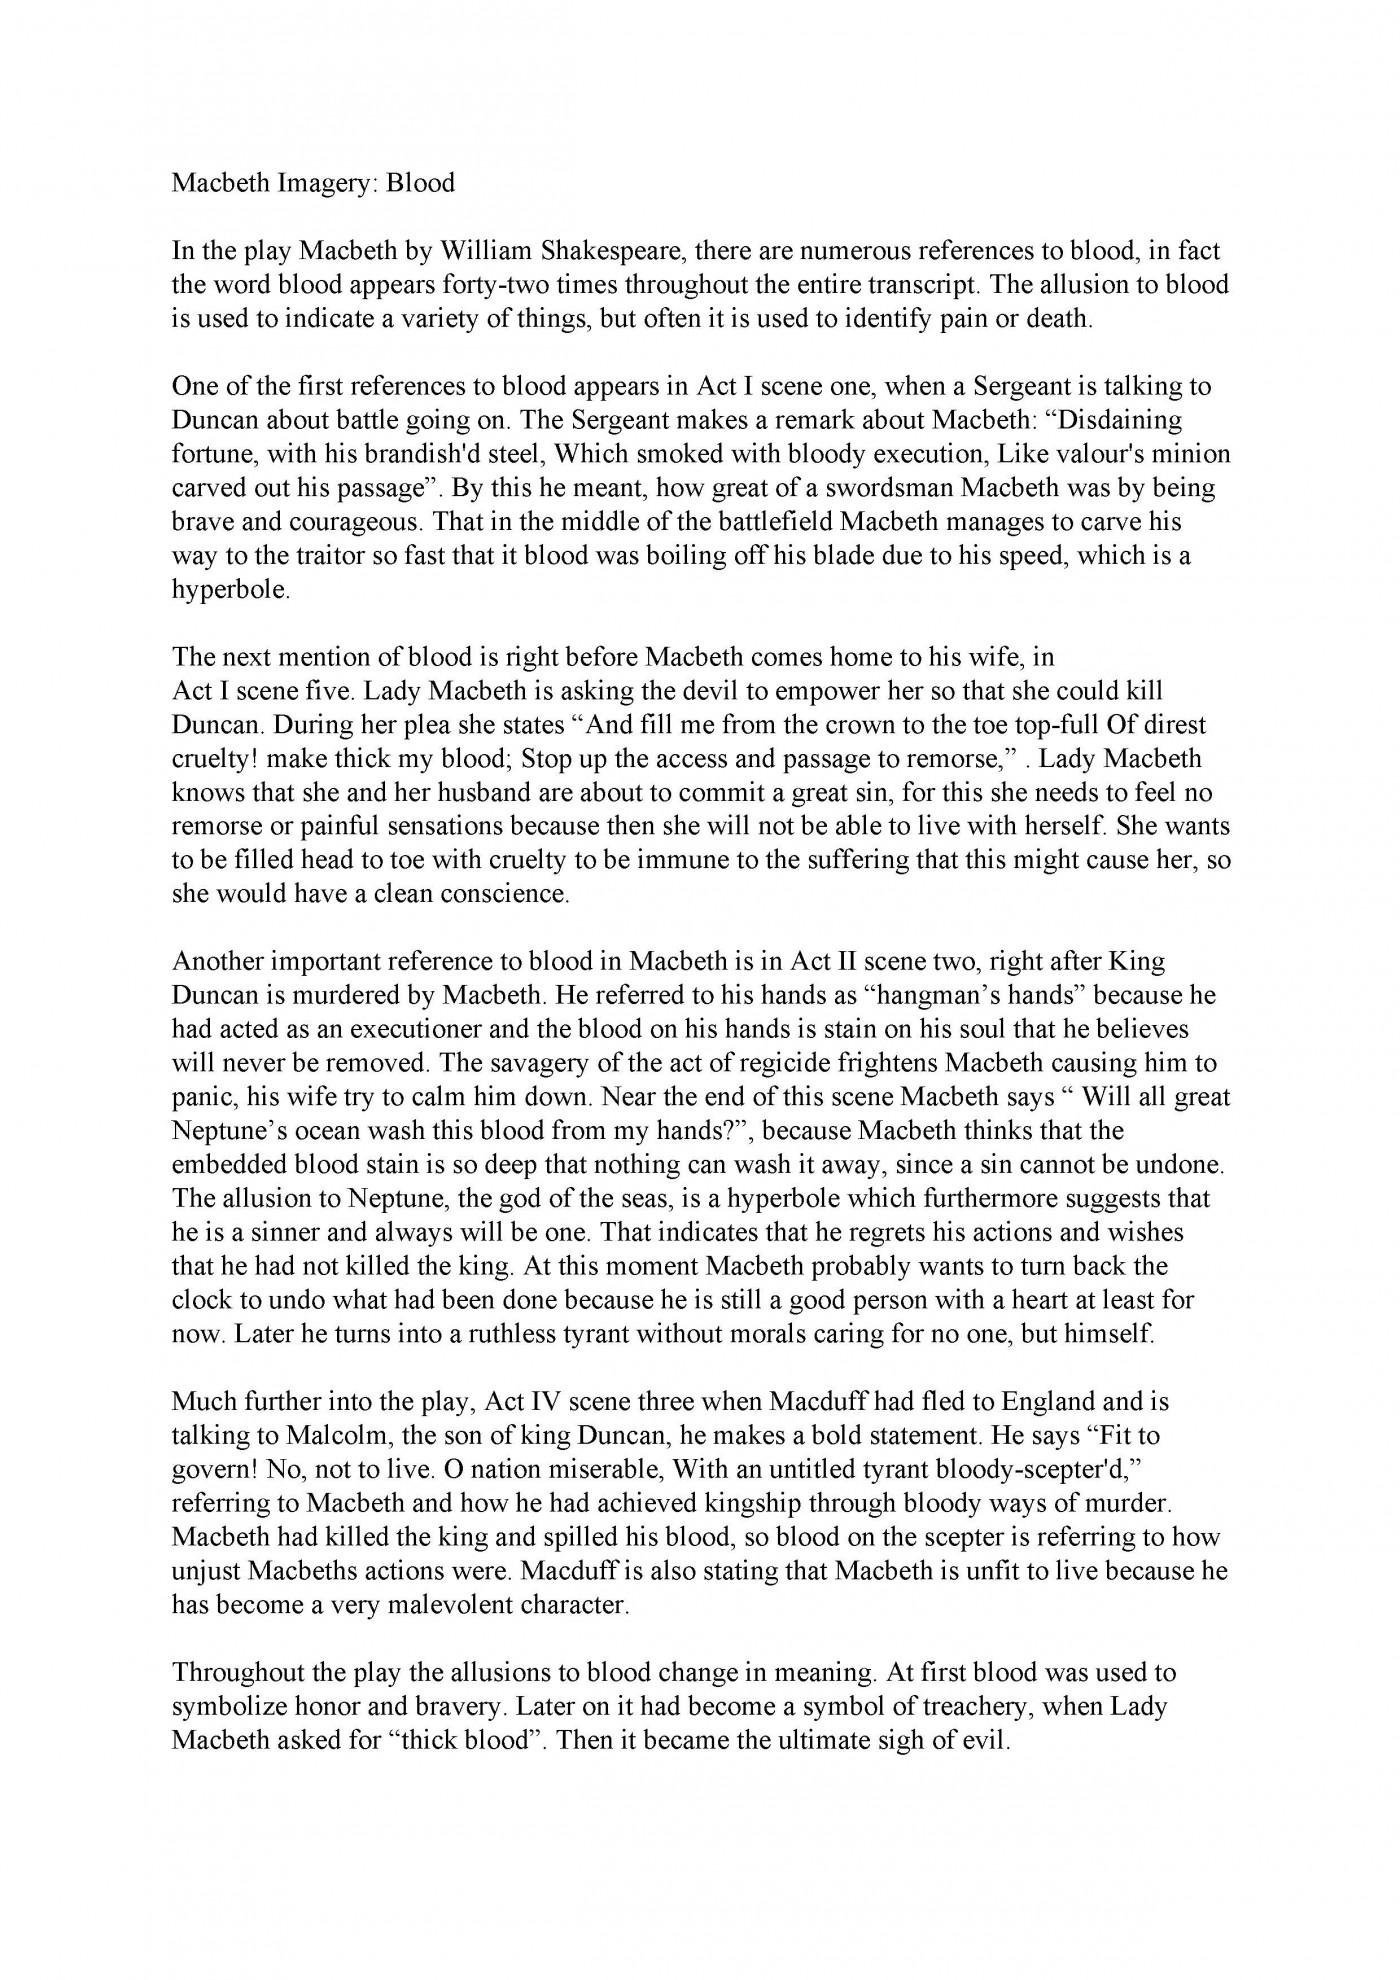 005 Essay Example Macbeth Sample Racism Dreaded Today 1400